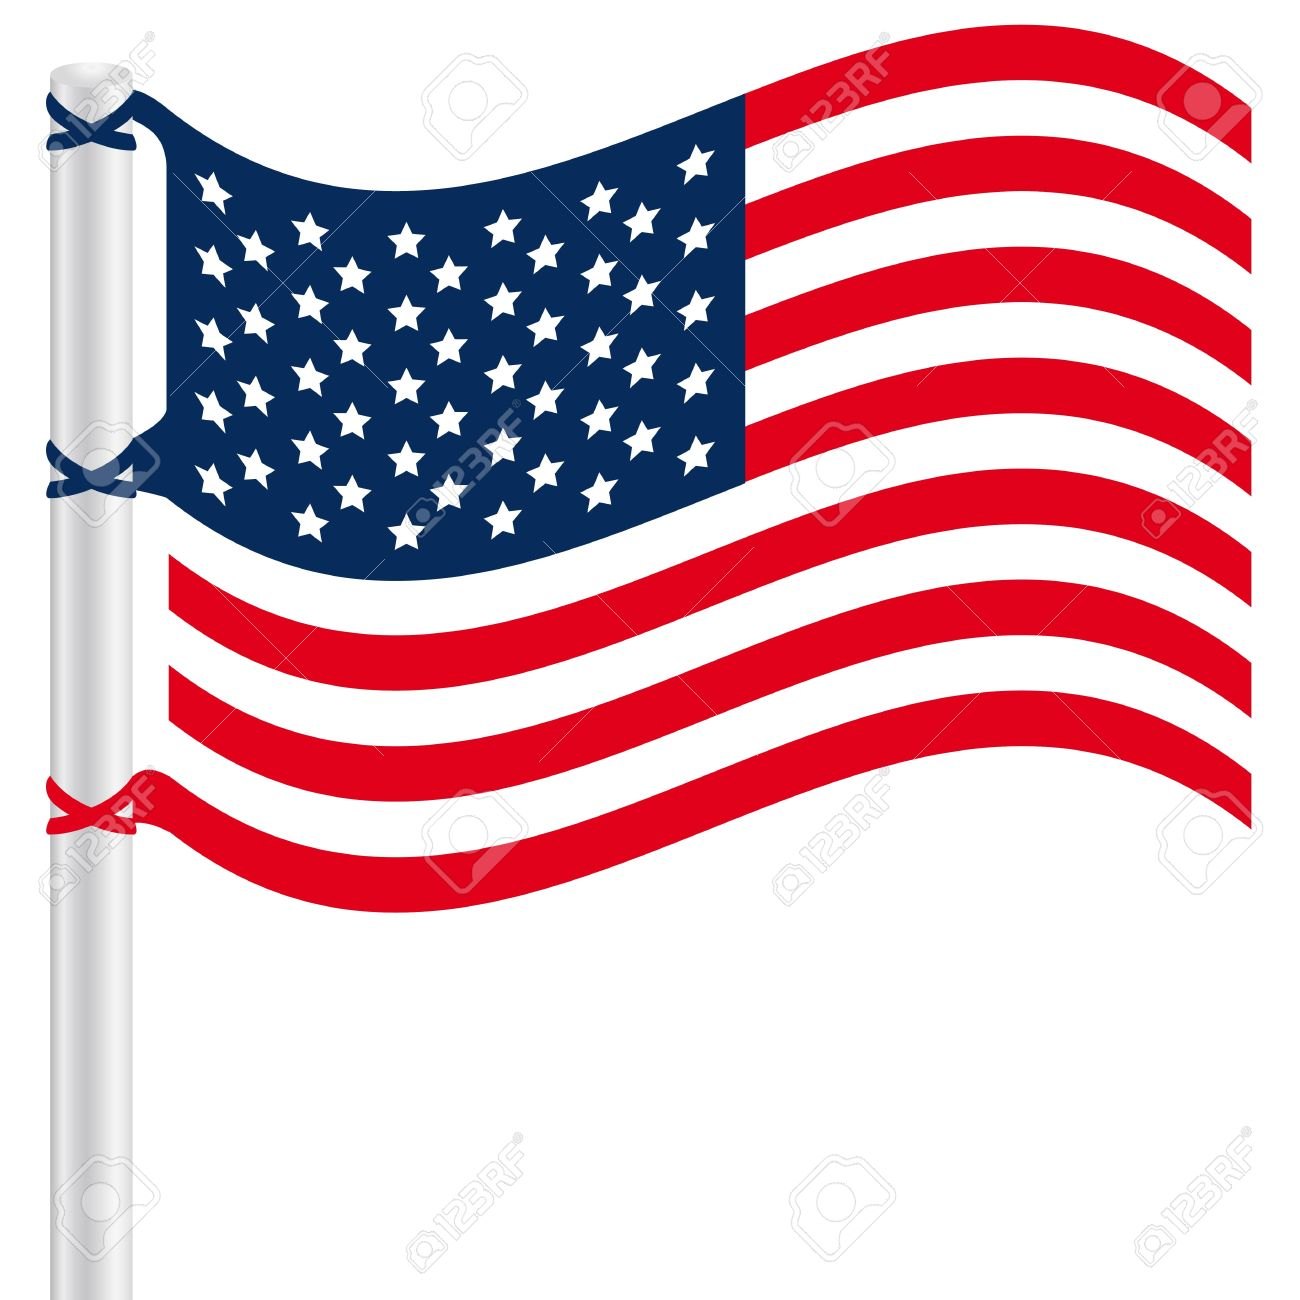 American flagpole clip art.